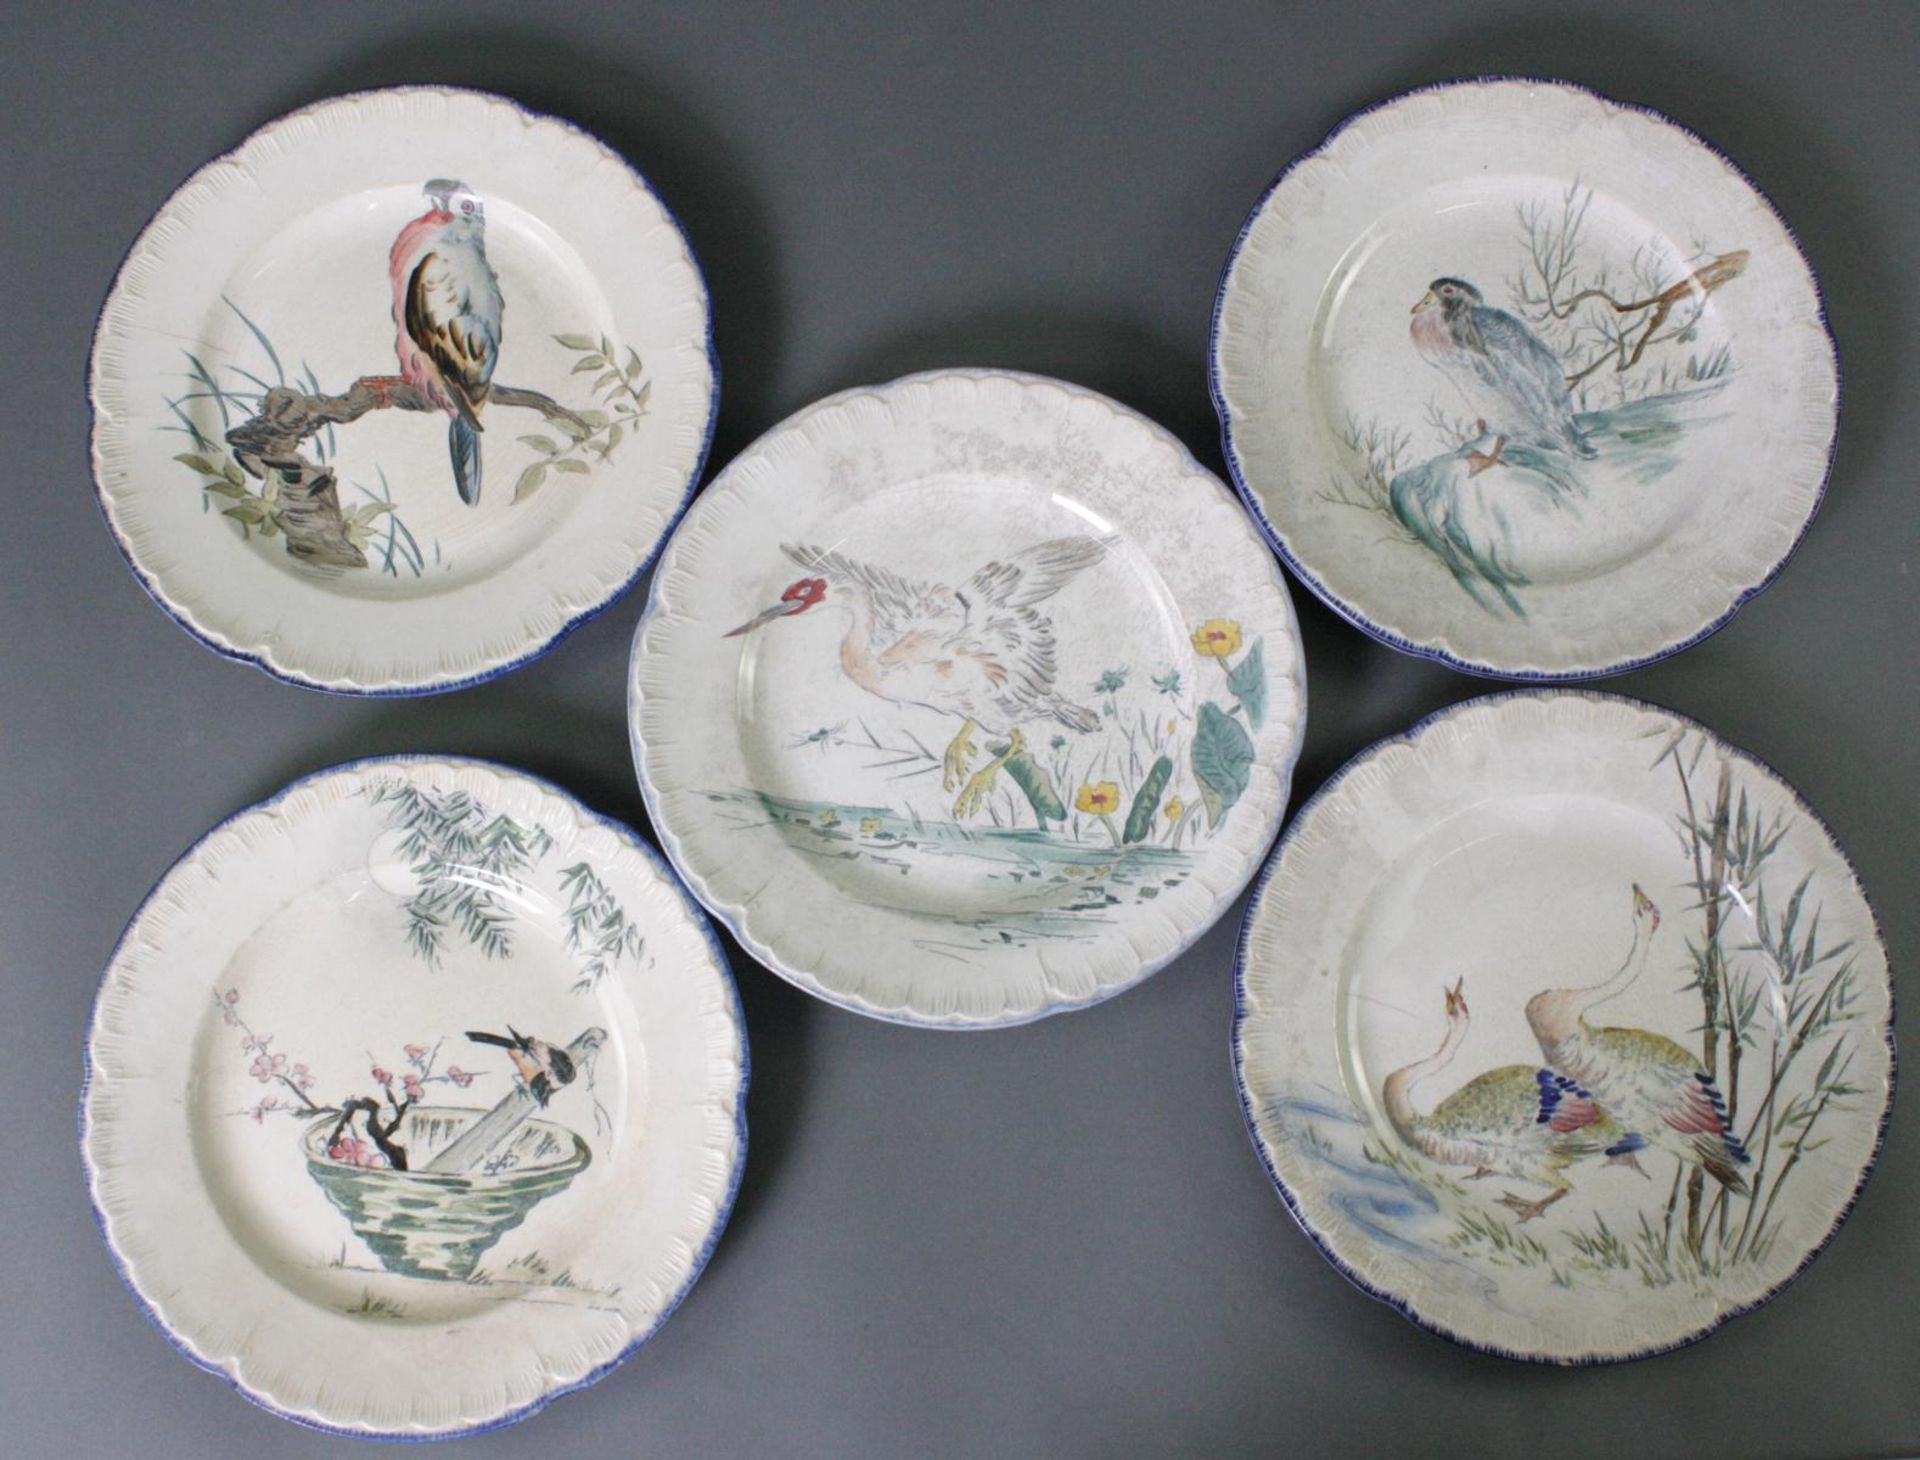 5 Keramikteller, Escalier de Cristal Paris